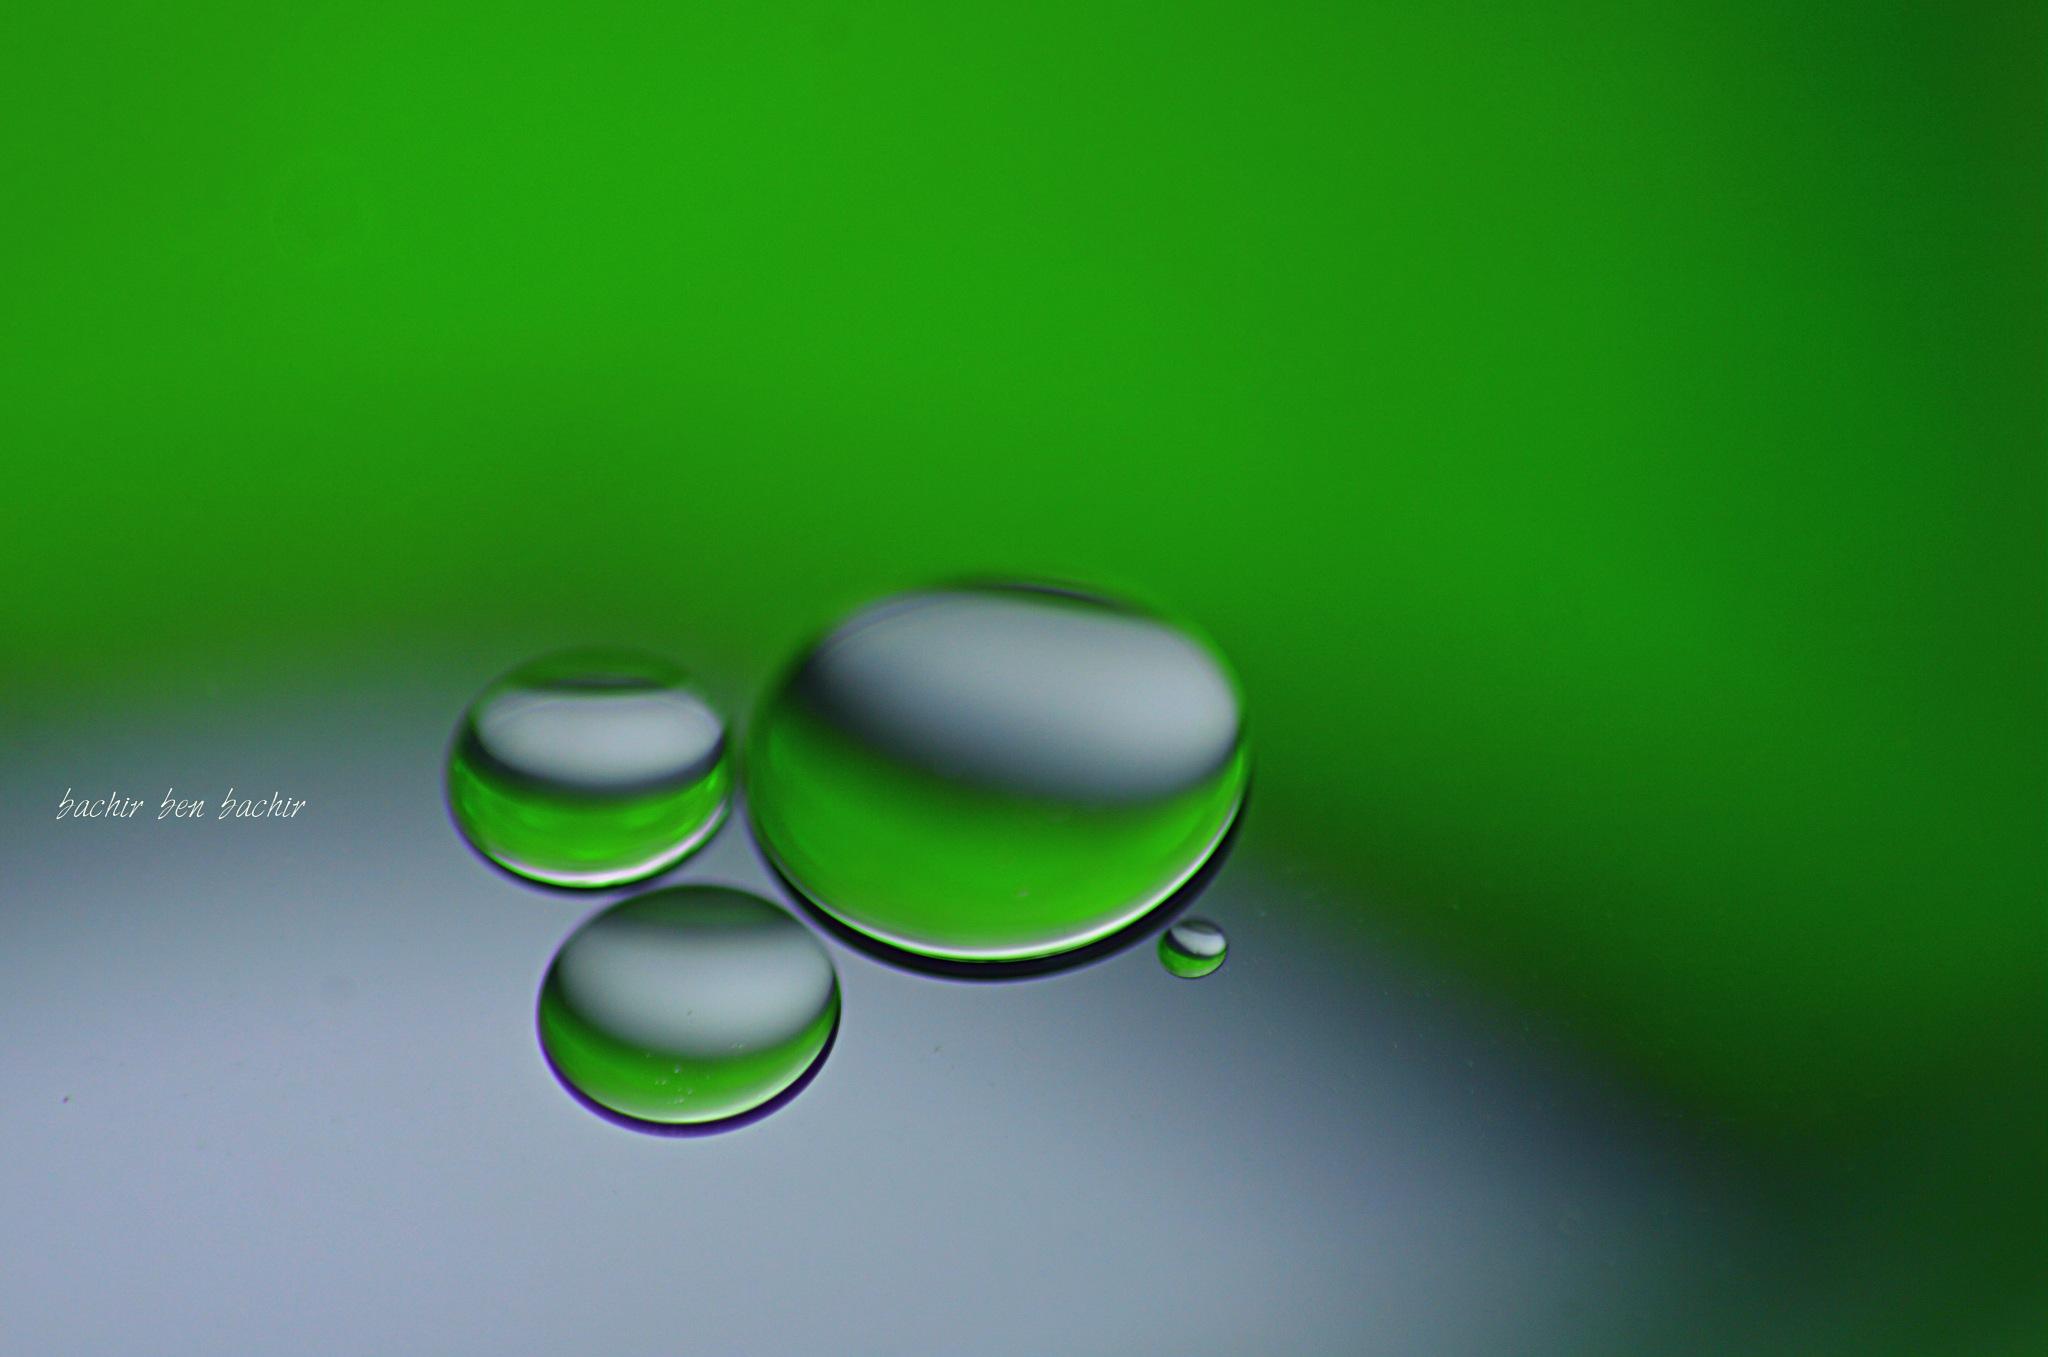 Oil drops by bachir.benbachir.5